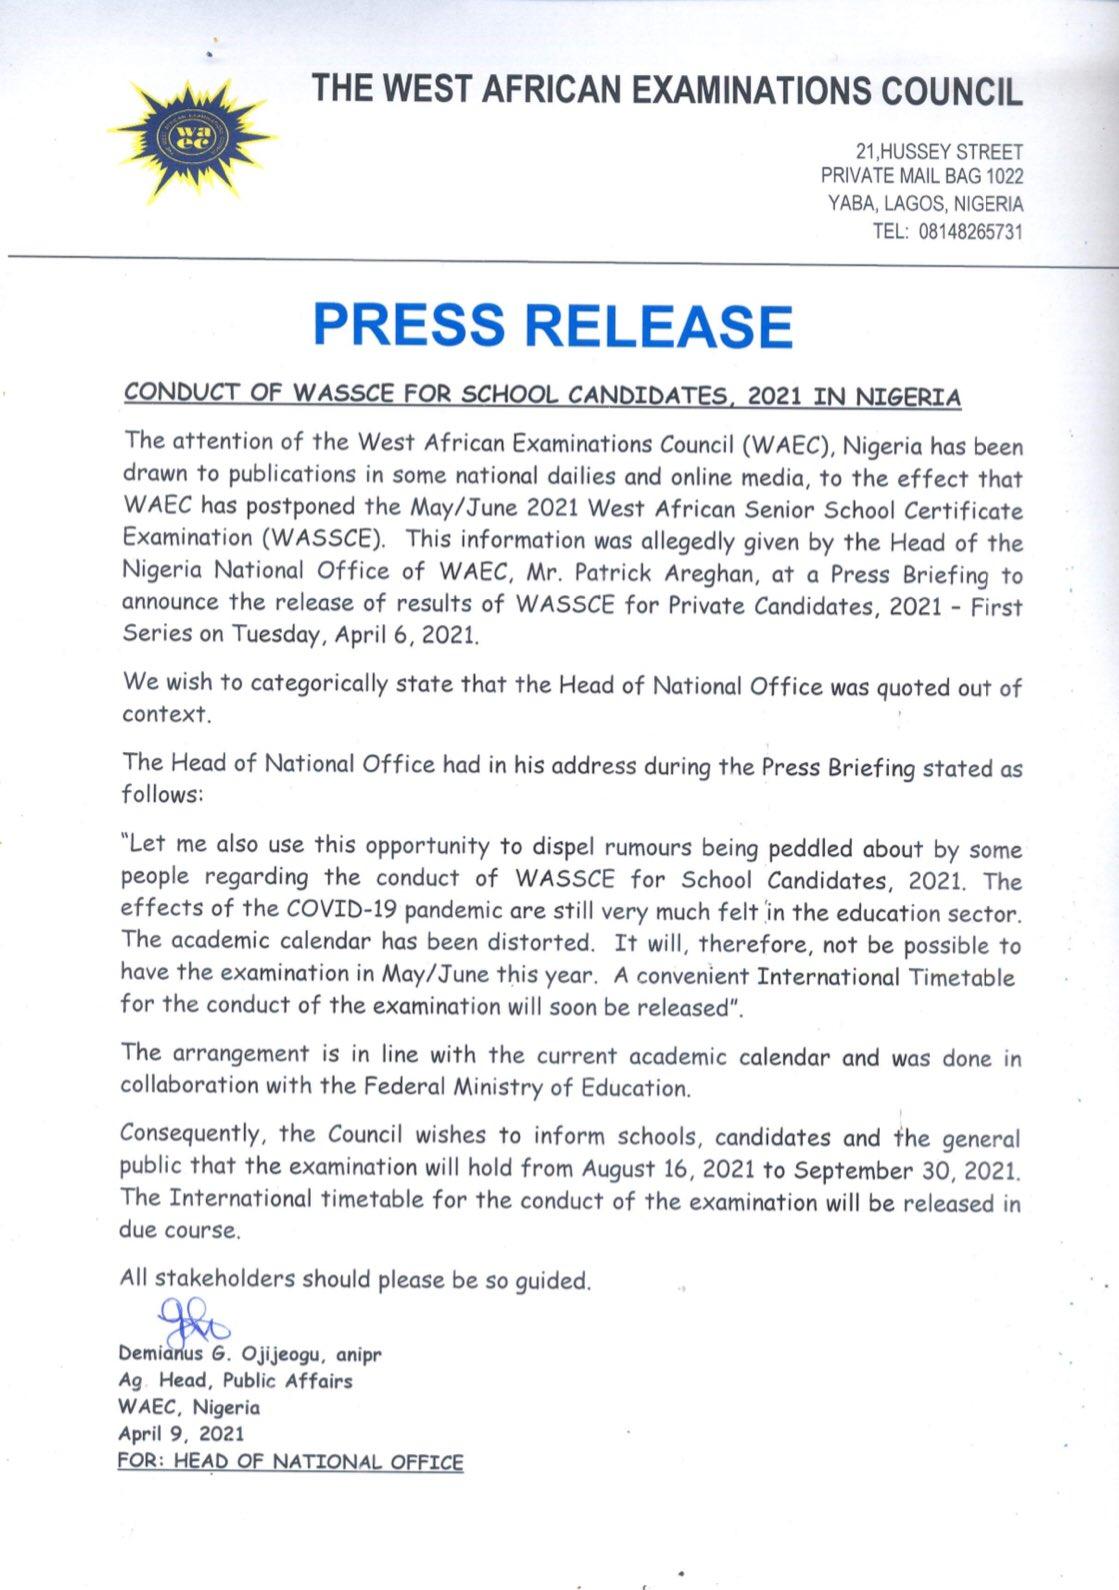 WAEC Announces New Dates For 2021 WASSCE